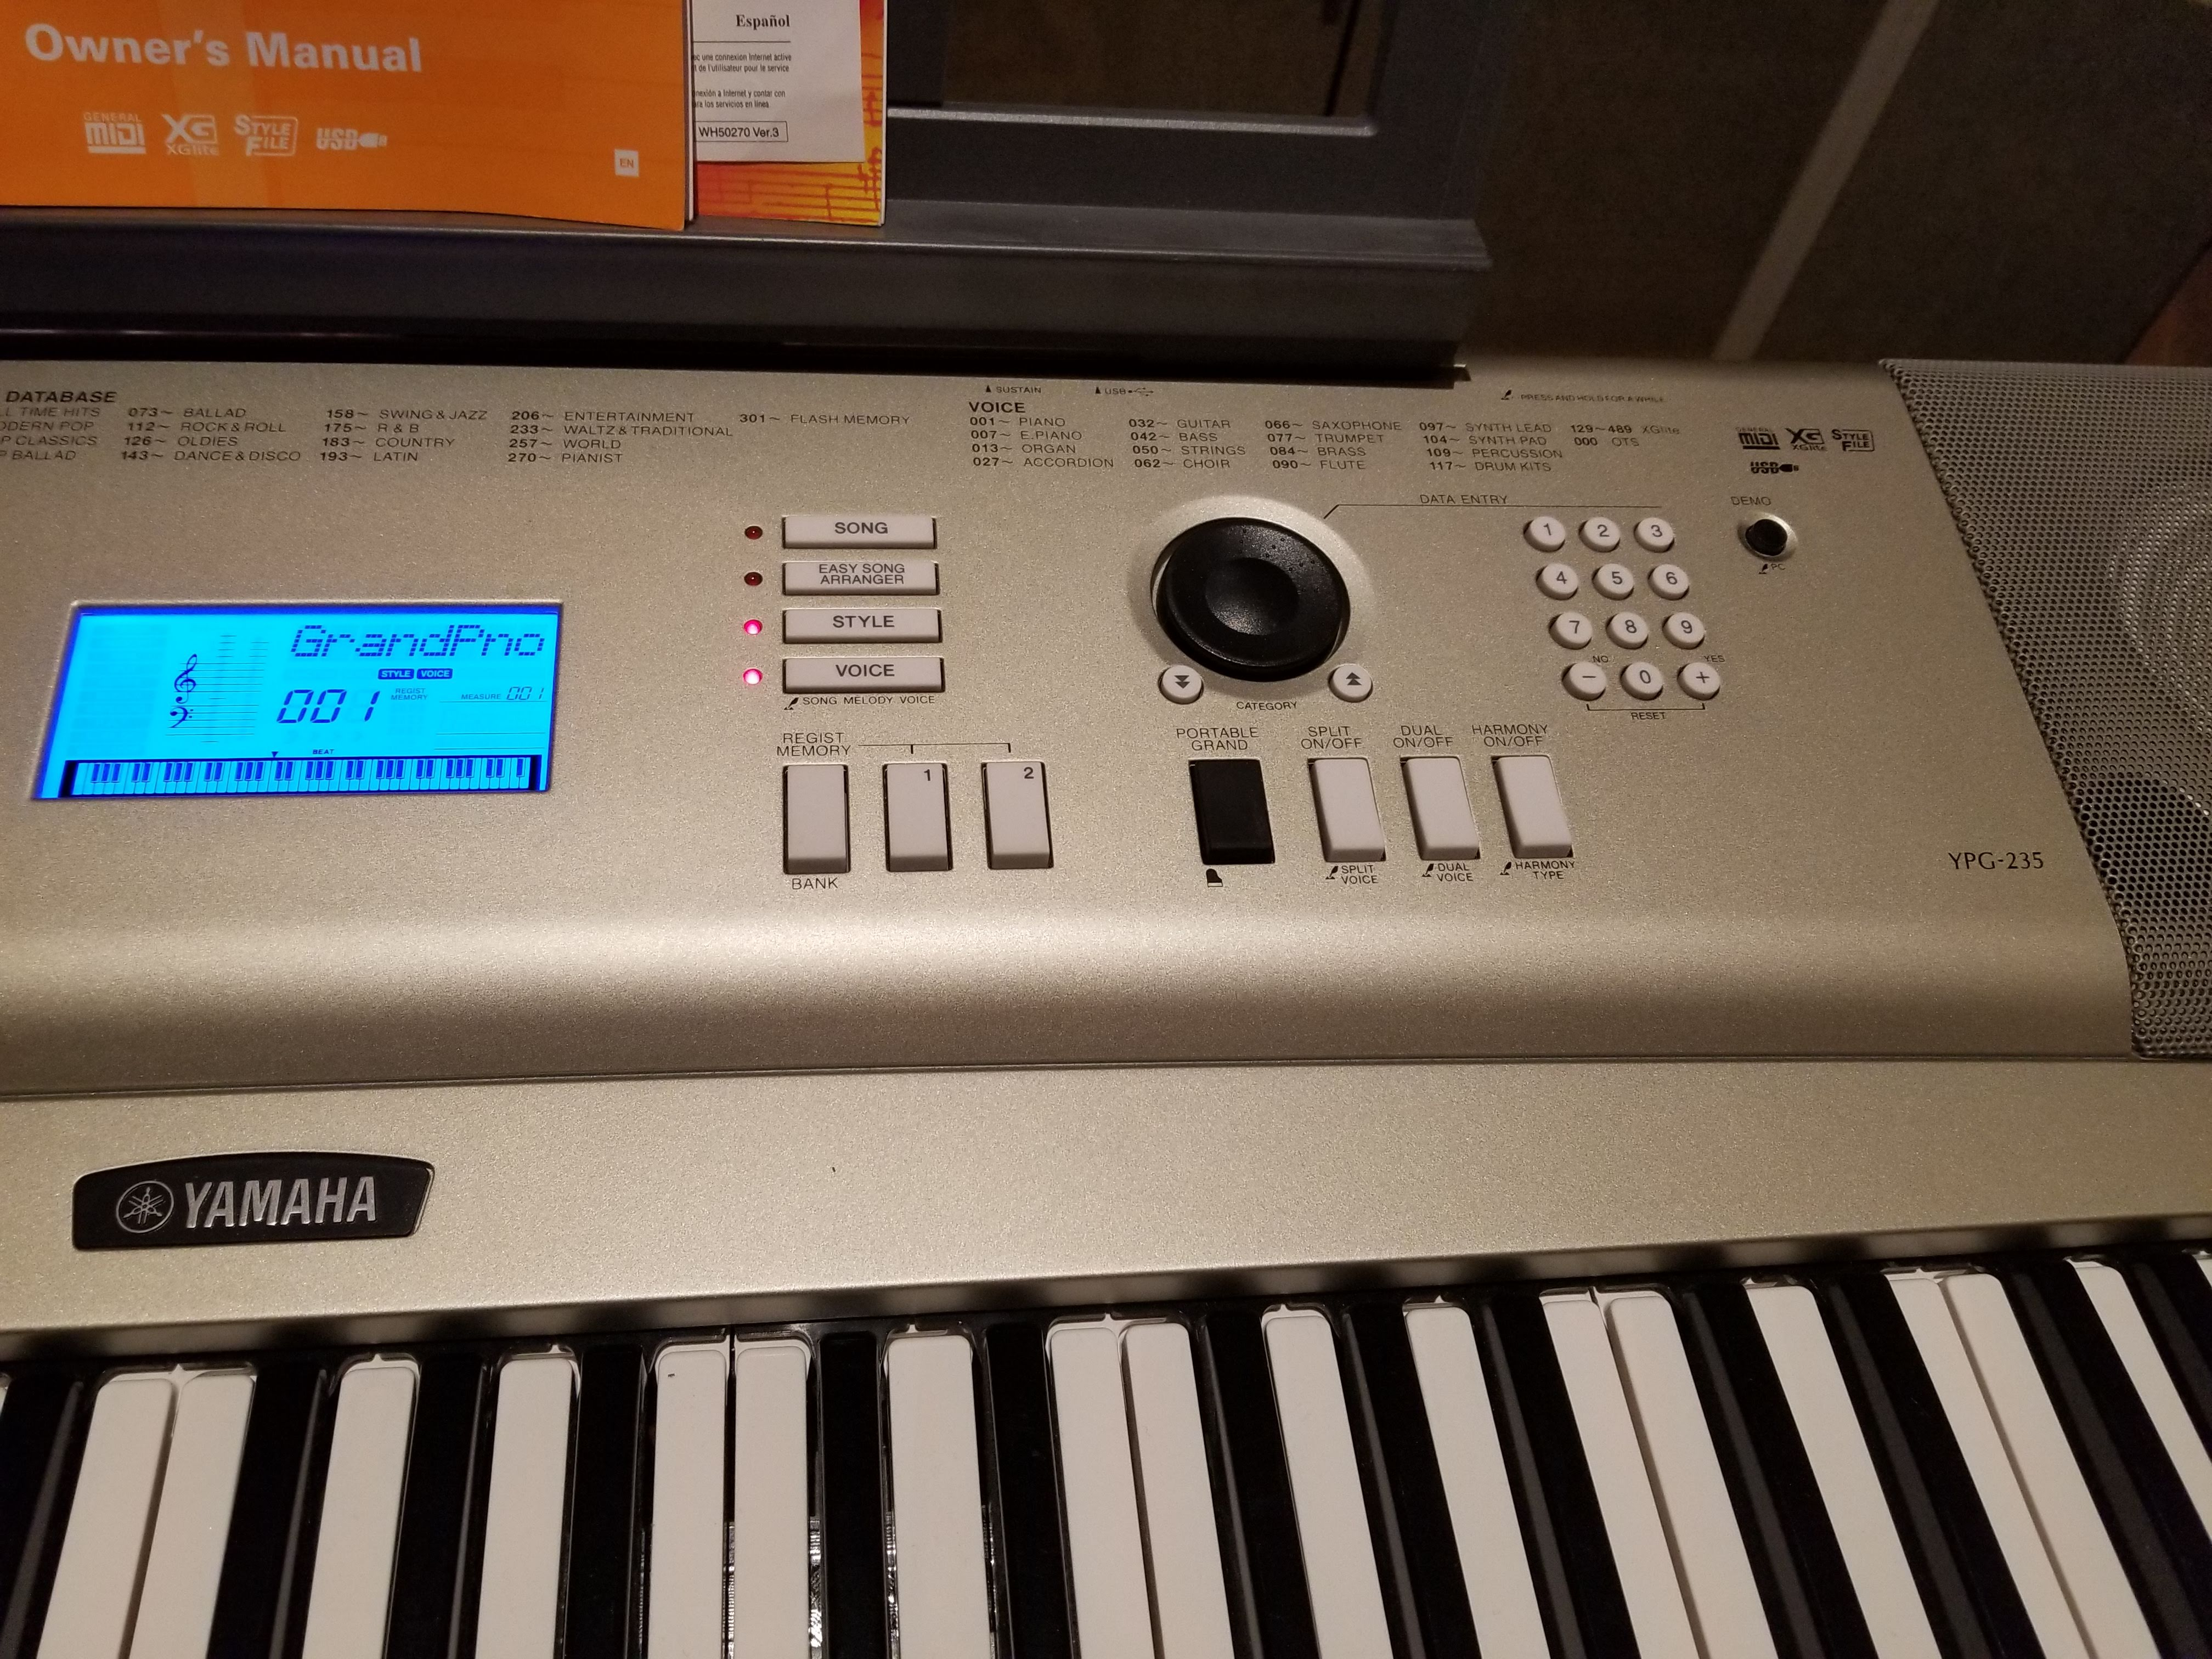 I own a Yamaha YPG-235/DPG-230 electric keyboard  I just put